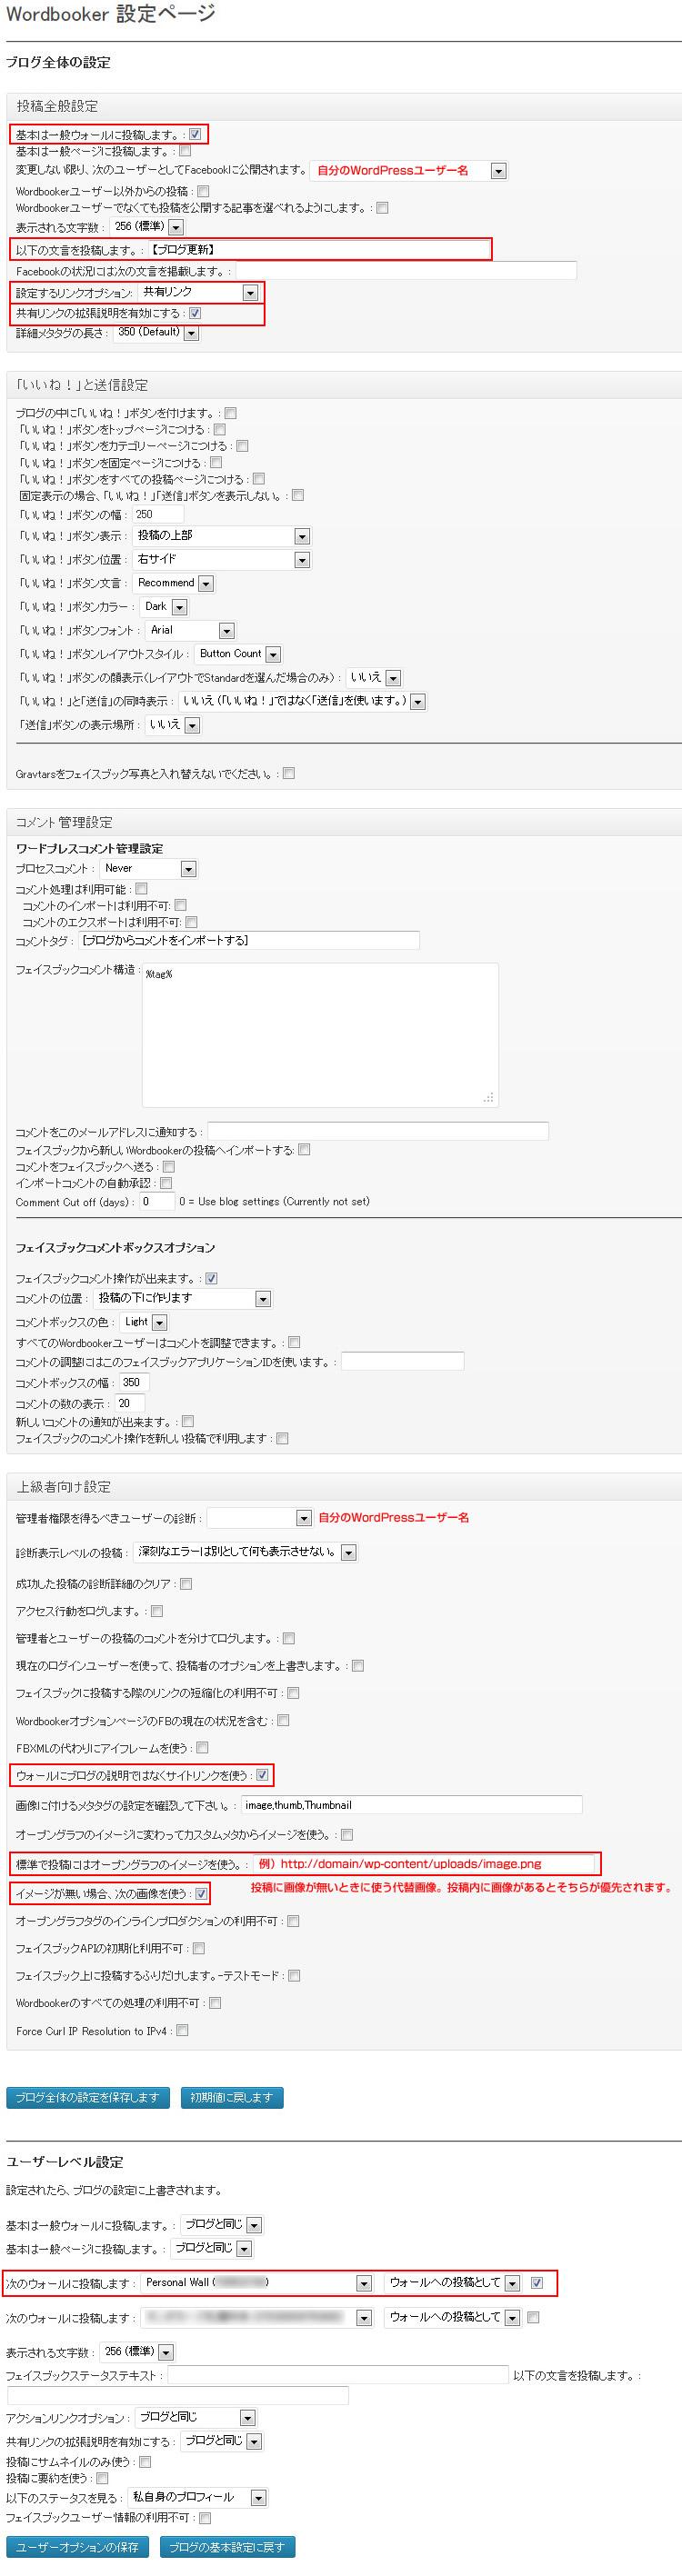 20130205 012 WordPressの投稿をFacebookに通知するプラグイン|Wordbooker